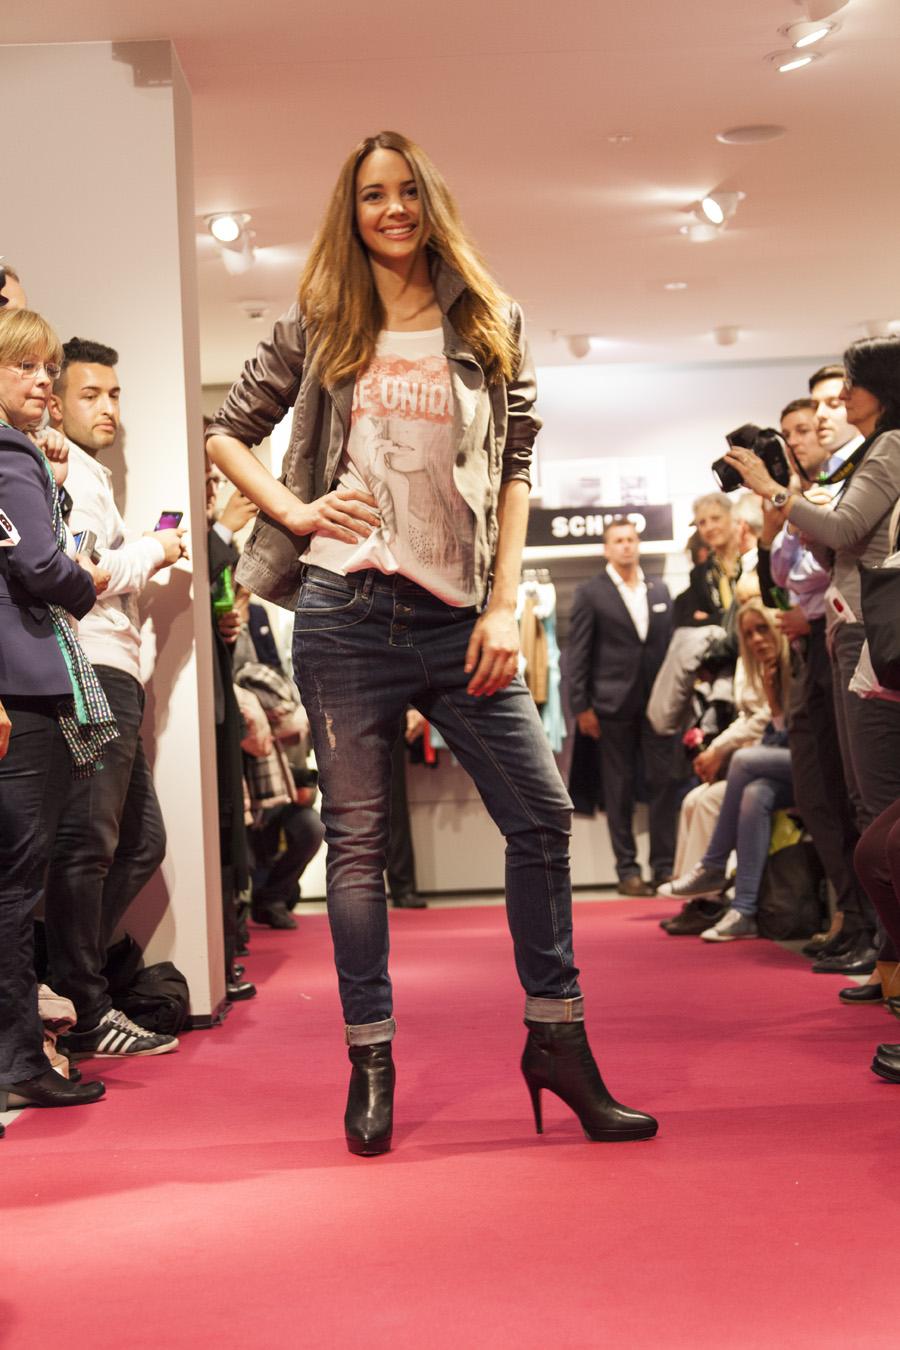 Miss Schweiz 2014 ist Laetitia Guarino